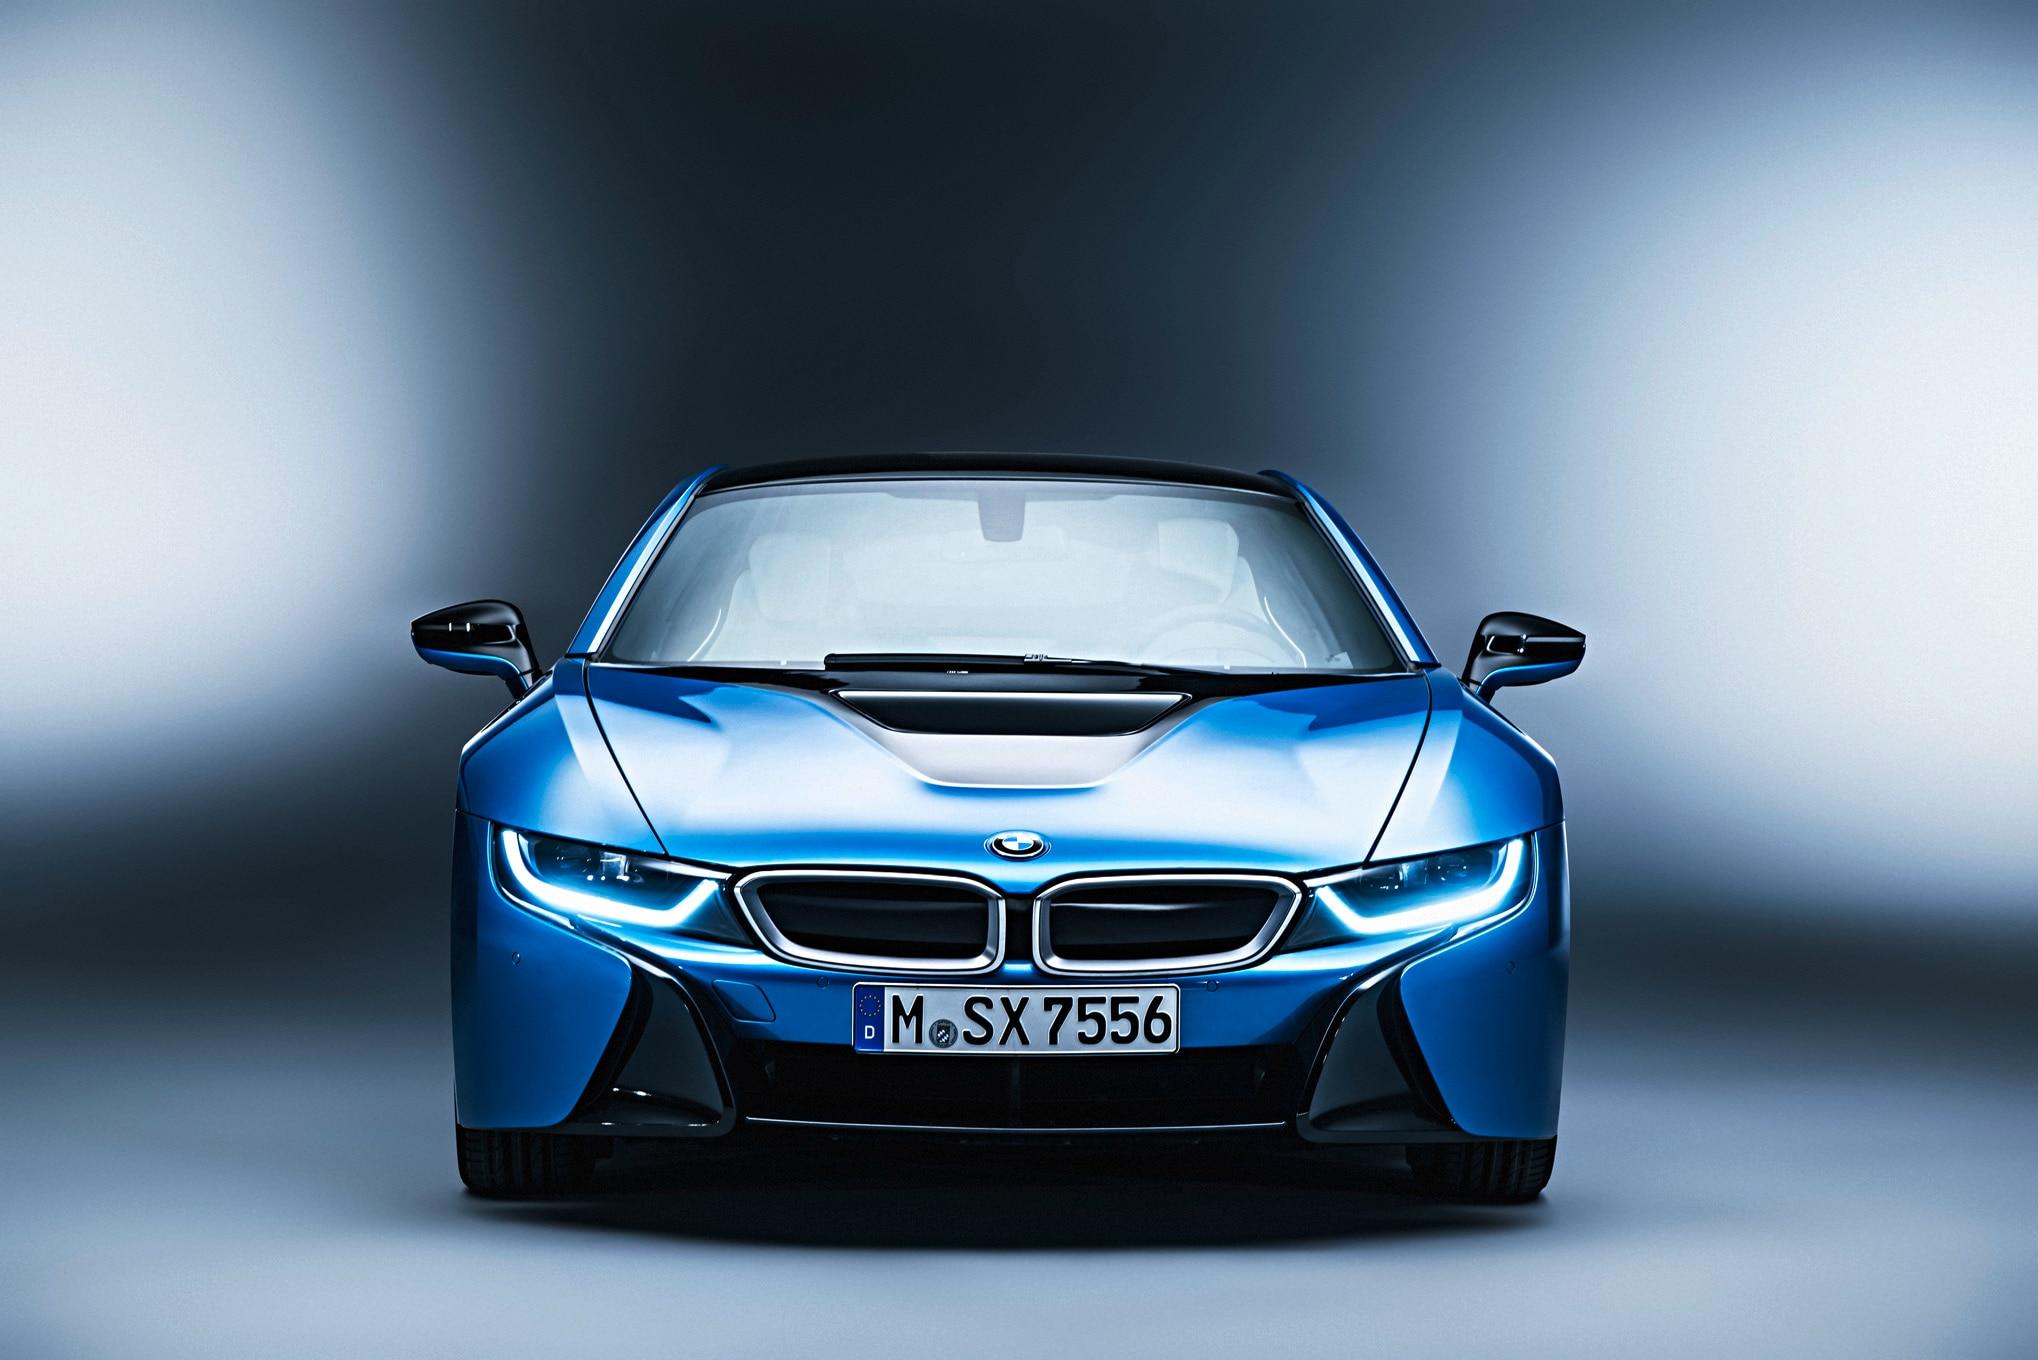 BMW I8 Mpg >> 2014 BMW i8 Review - Automobile Magazine